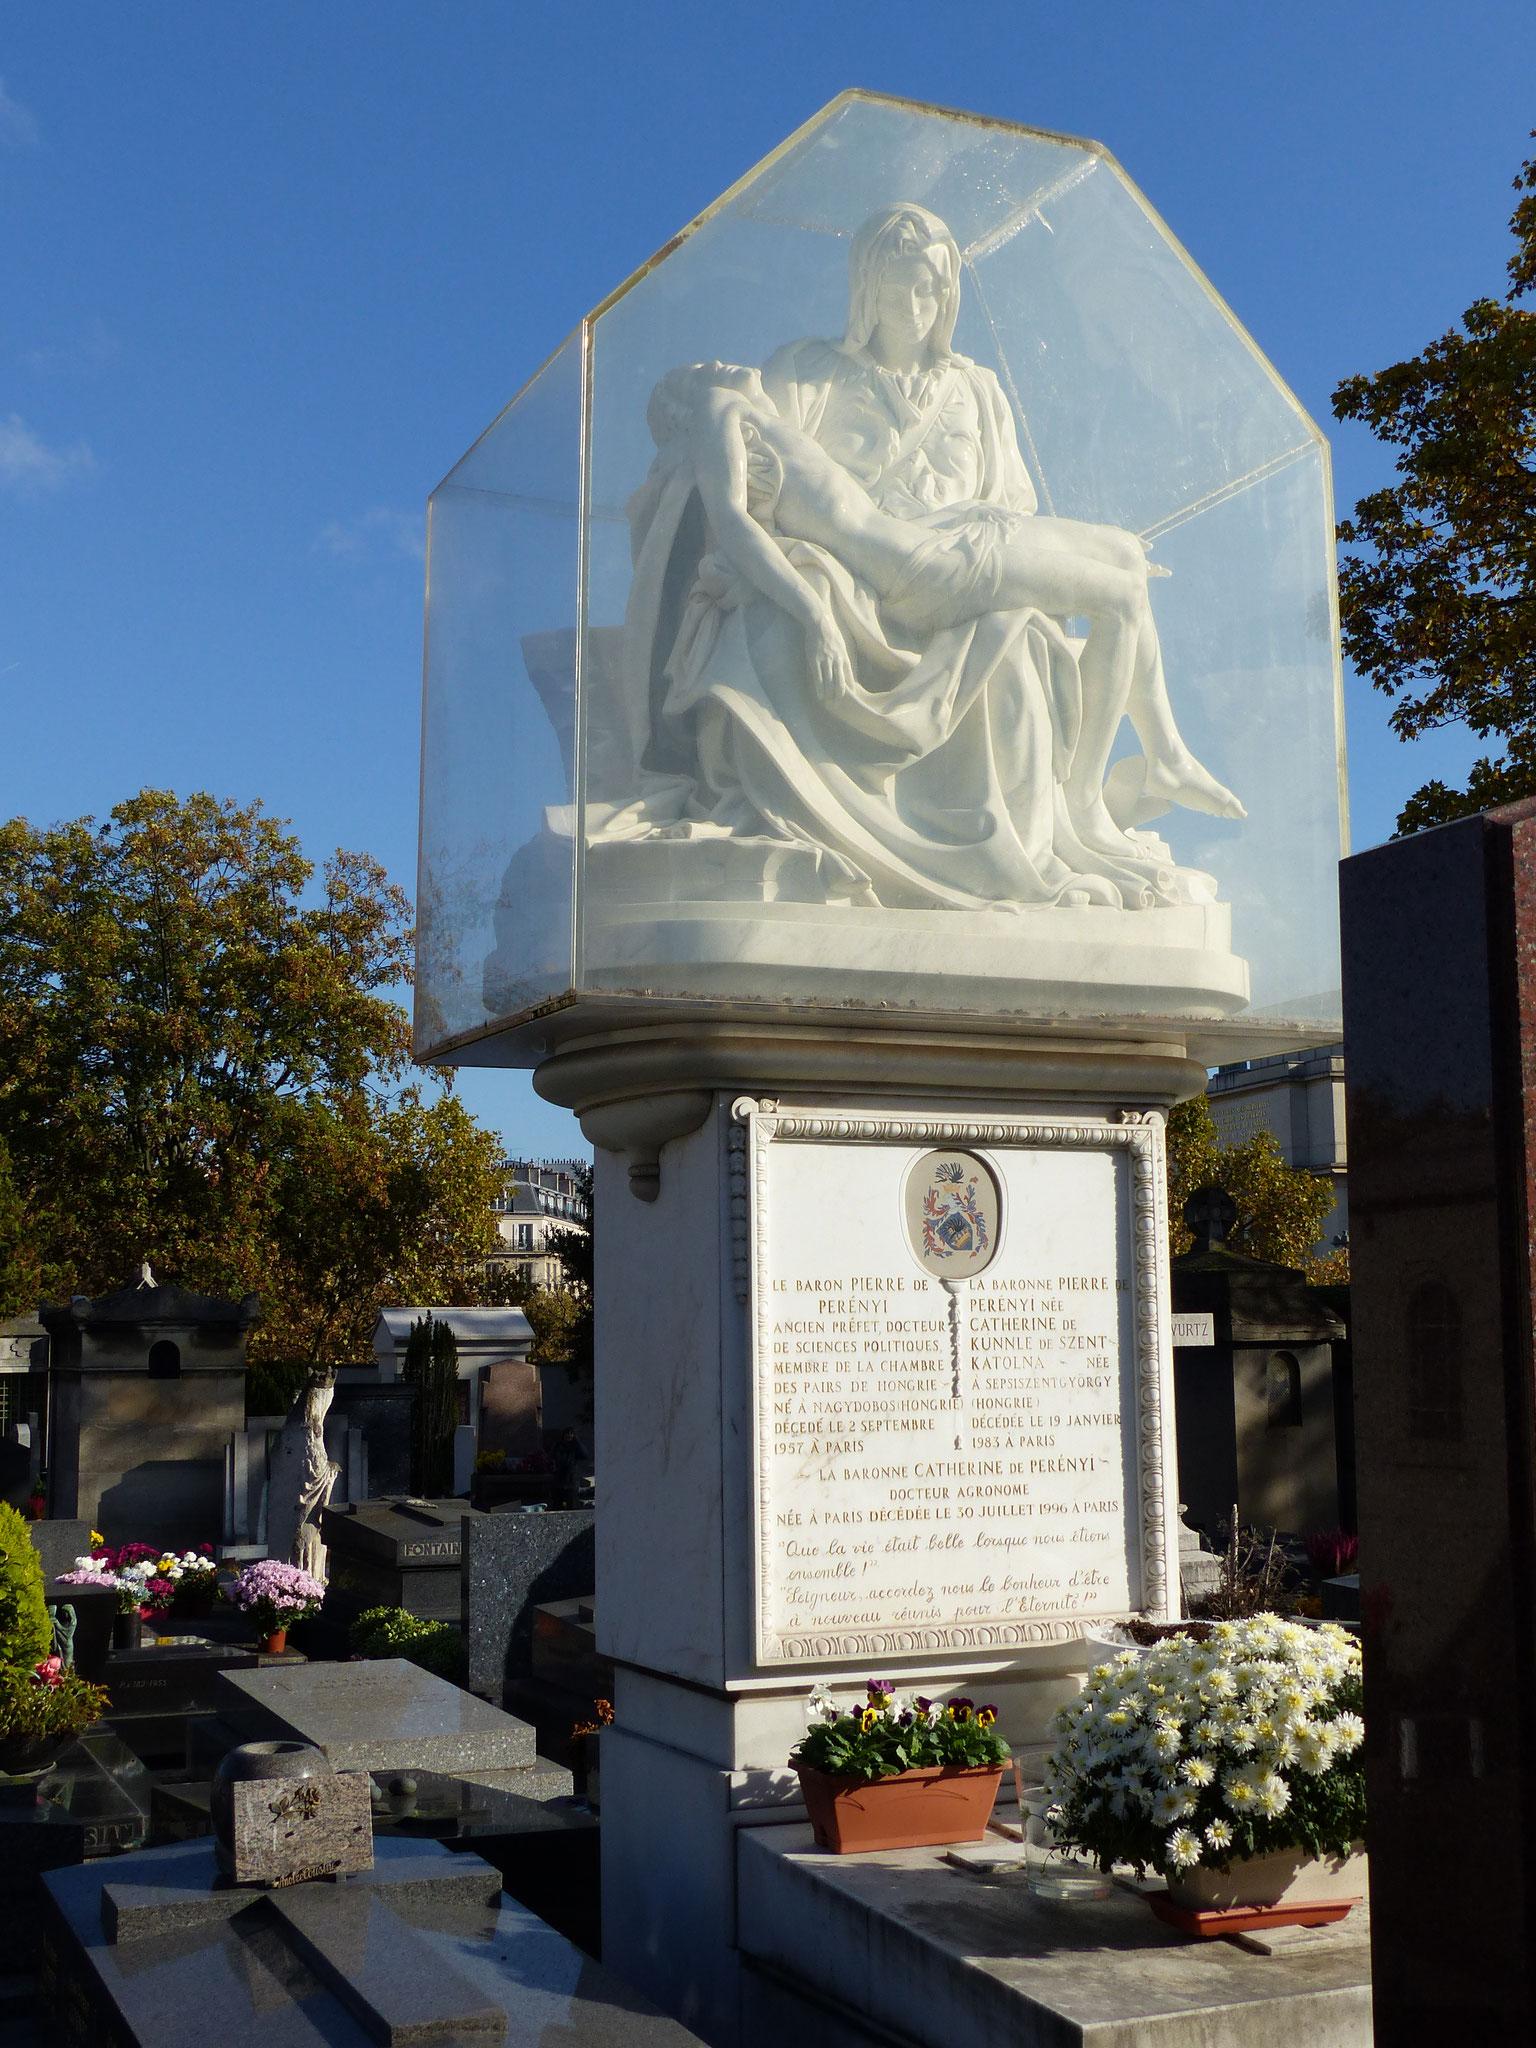 Reproduction de la Pieta de Michel - tombe Baron Pizeez sz Pzeznyi